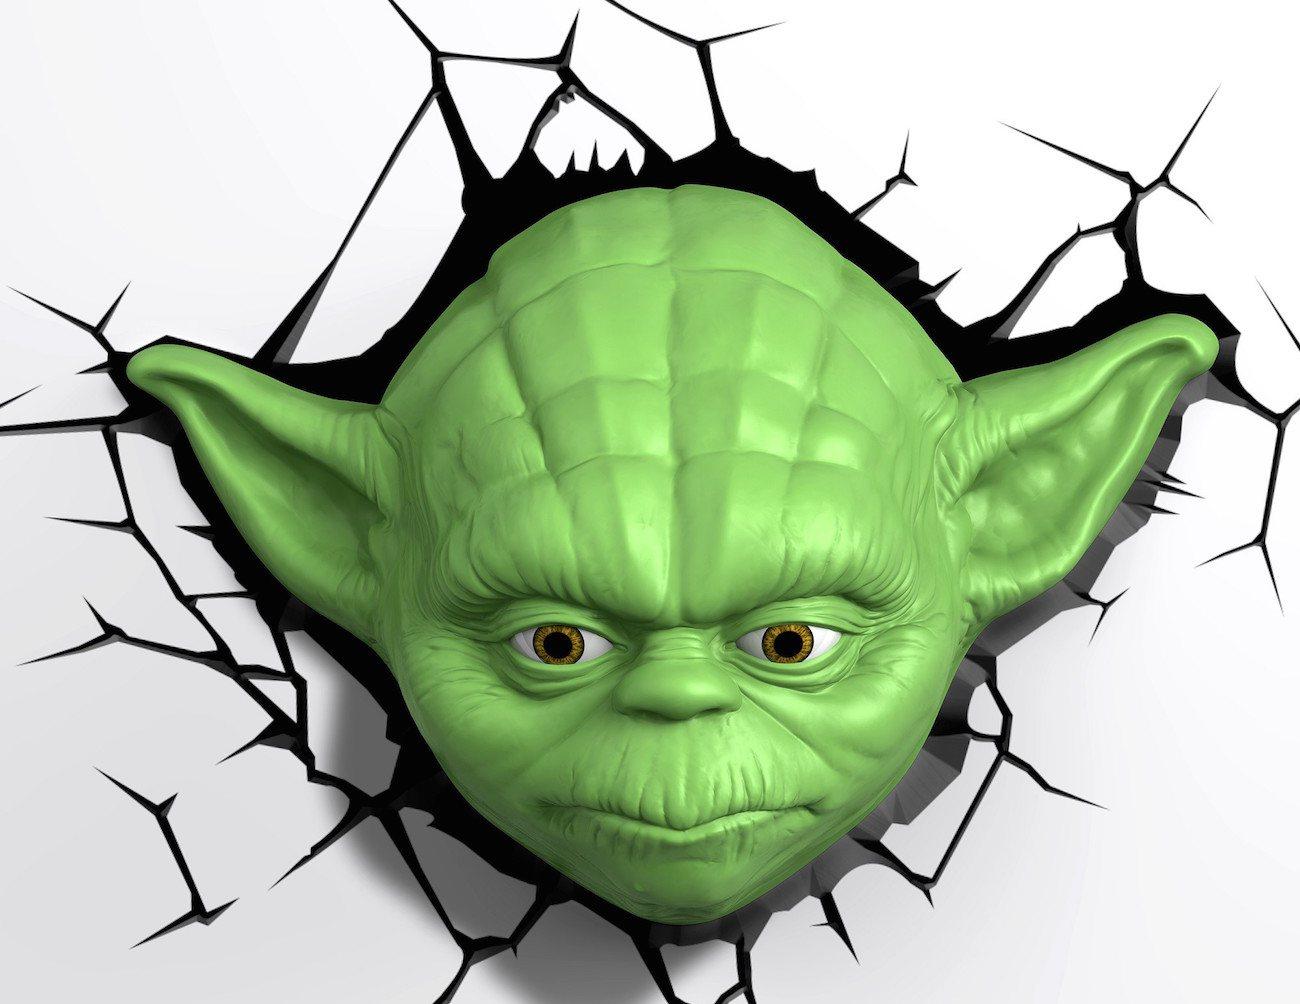 Star Wars Yoda 3D Deco Light